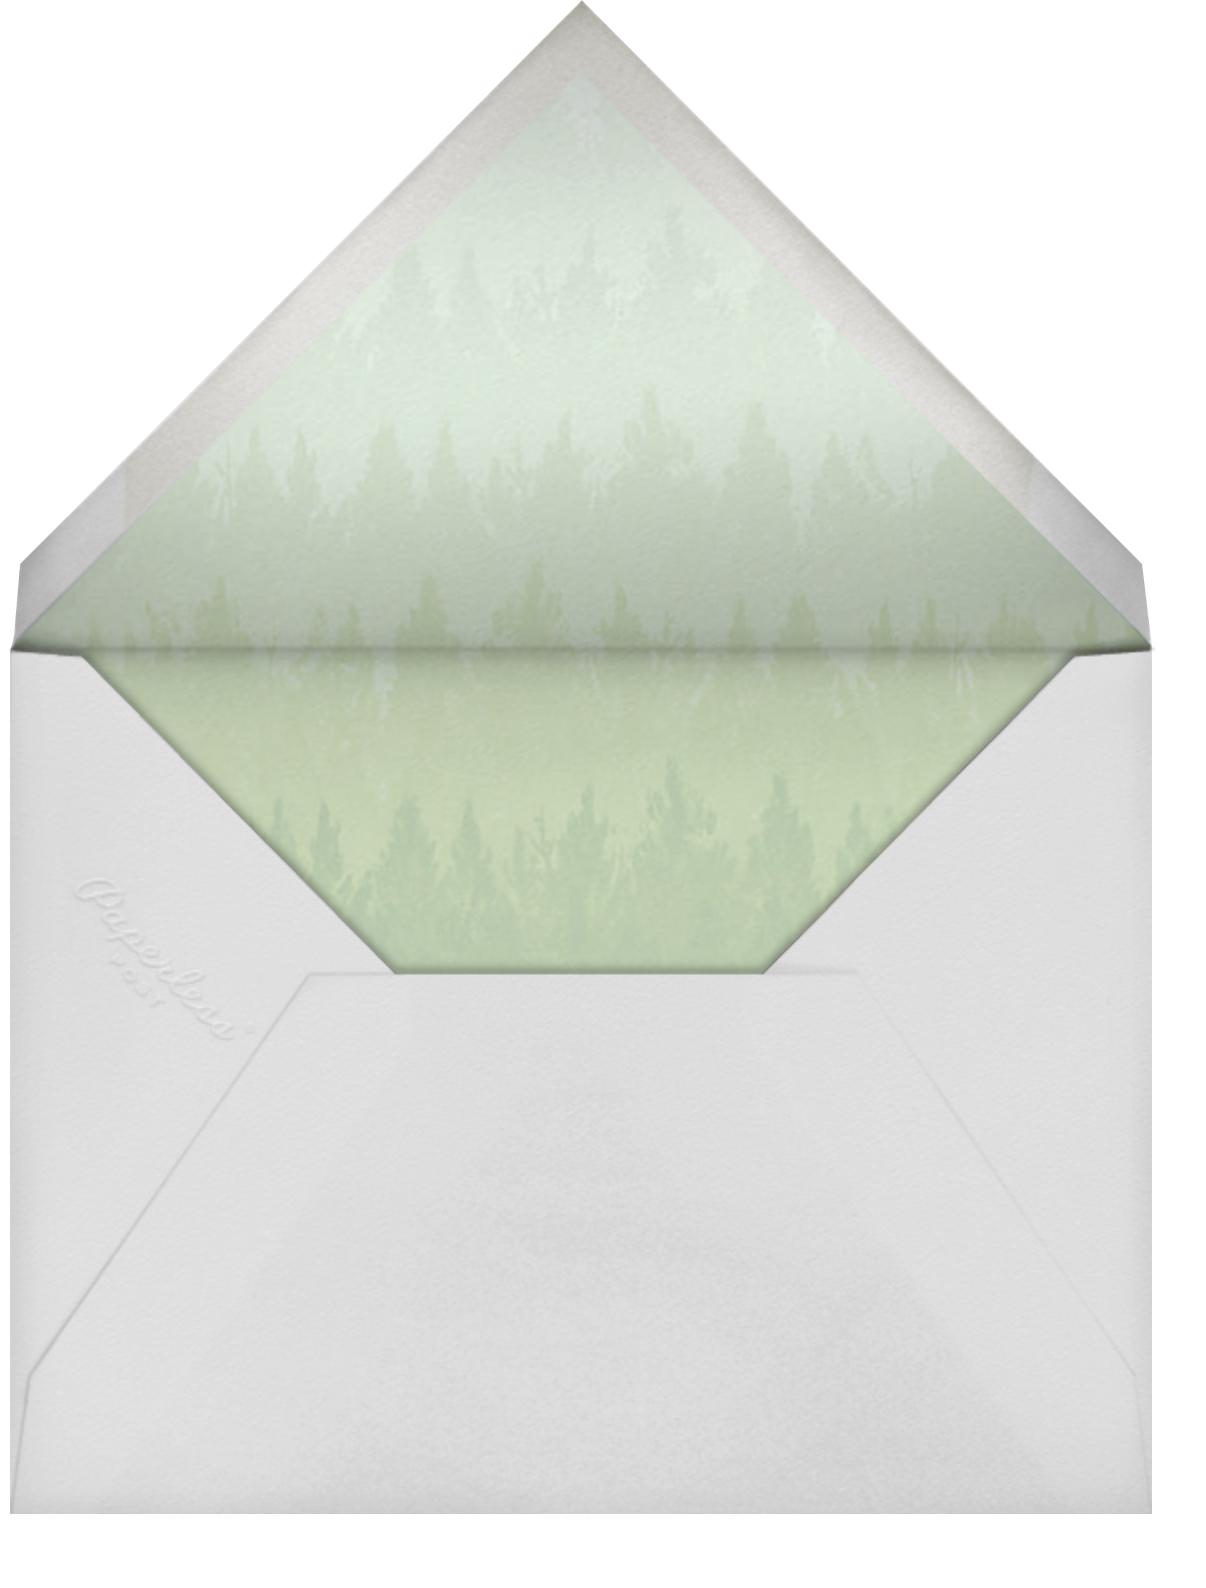 Rainier (Photo Save the Date) - Paperless Post - Envelope